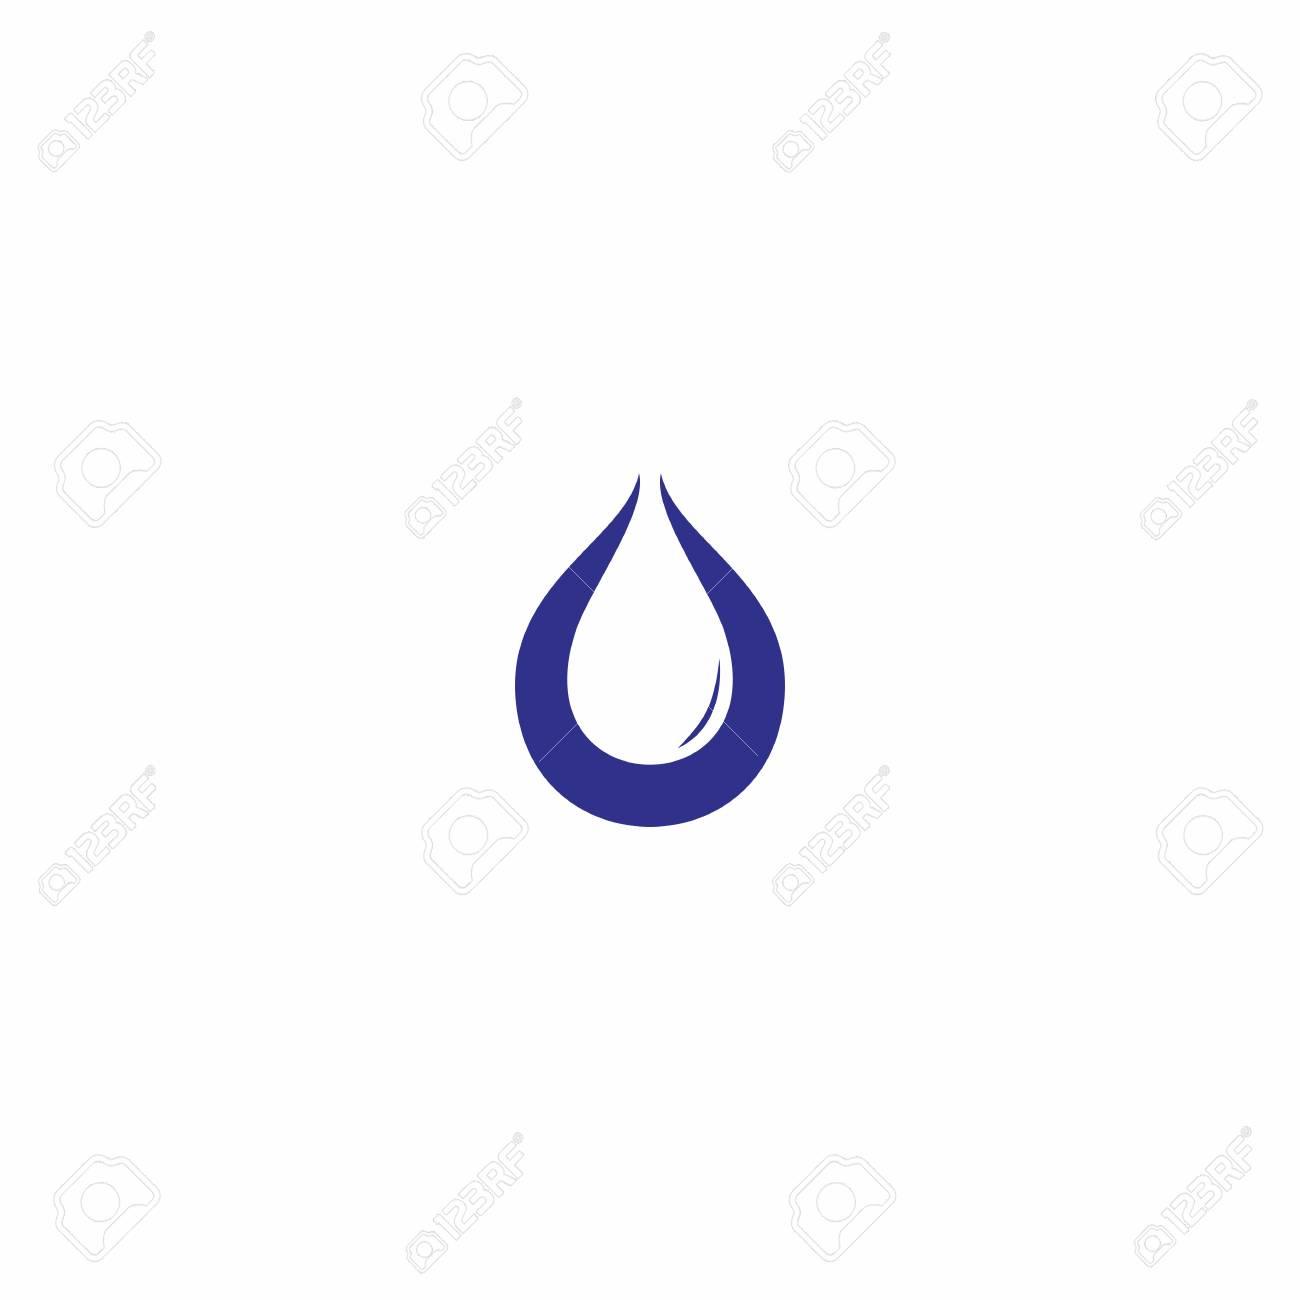 water droplet logo vector royalty free cliparts vectors and stock